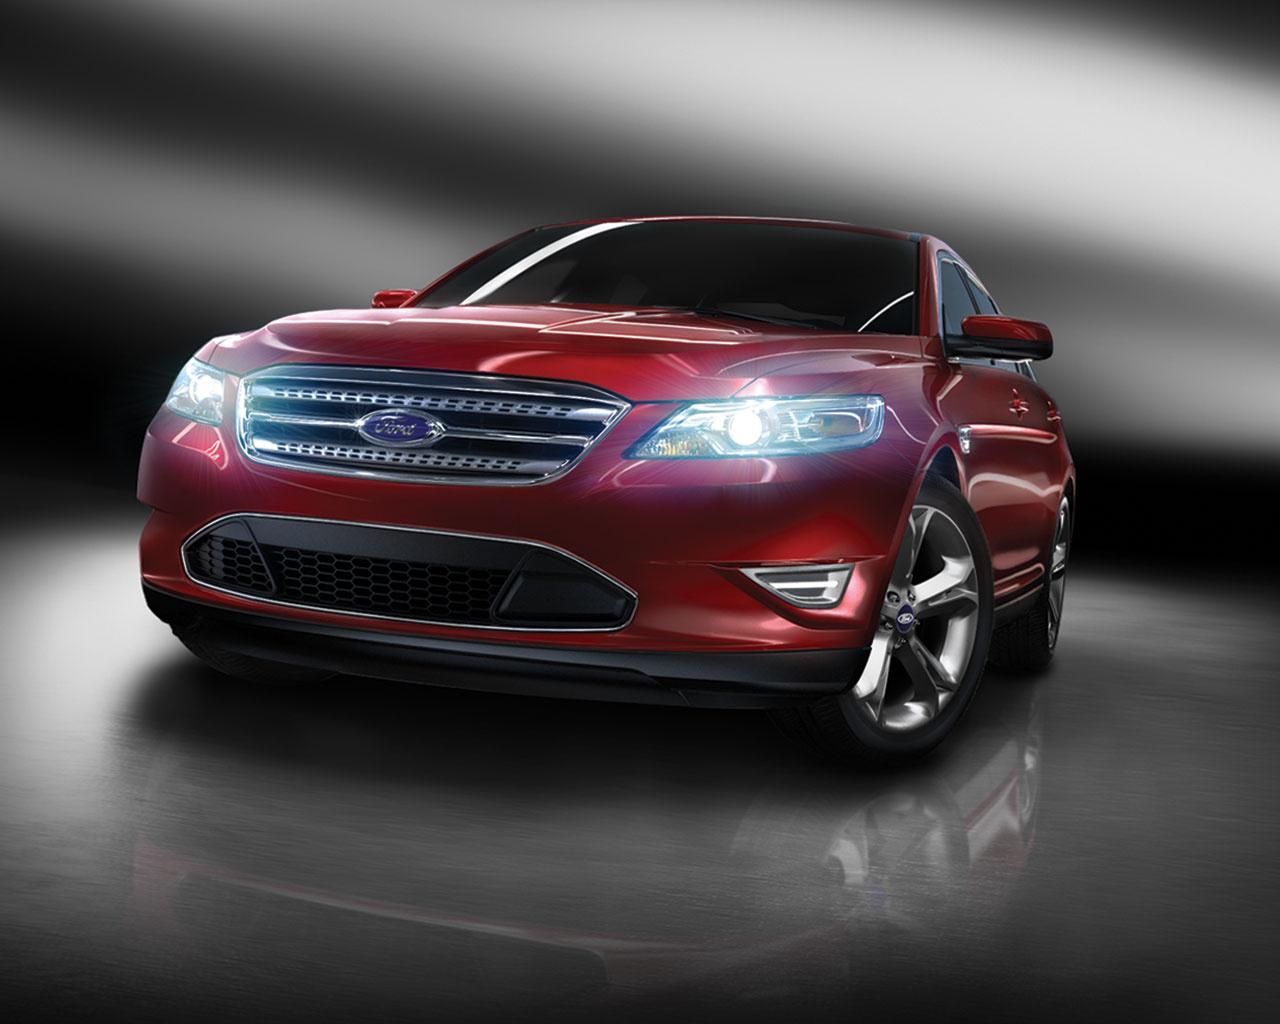 & 2010 Ford Taurus - Overview - CarGurus markmcfarlin.com